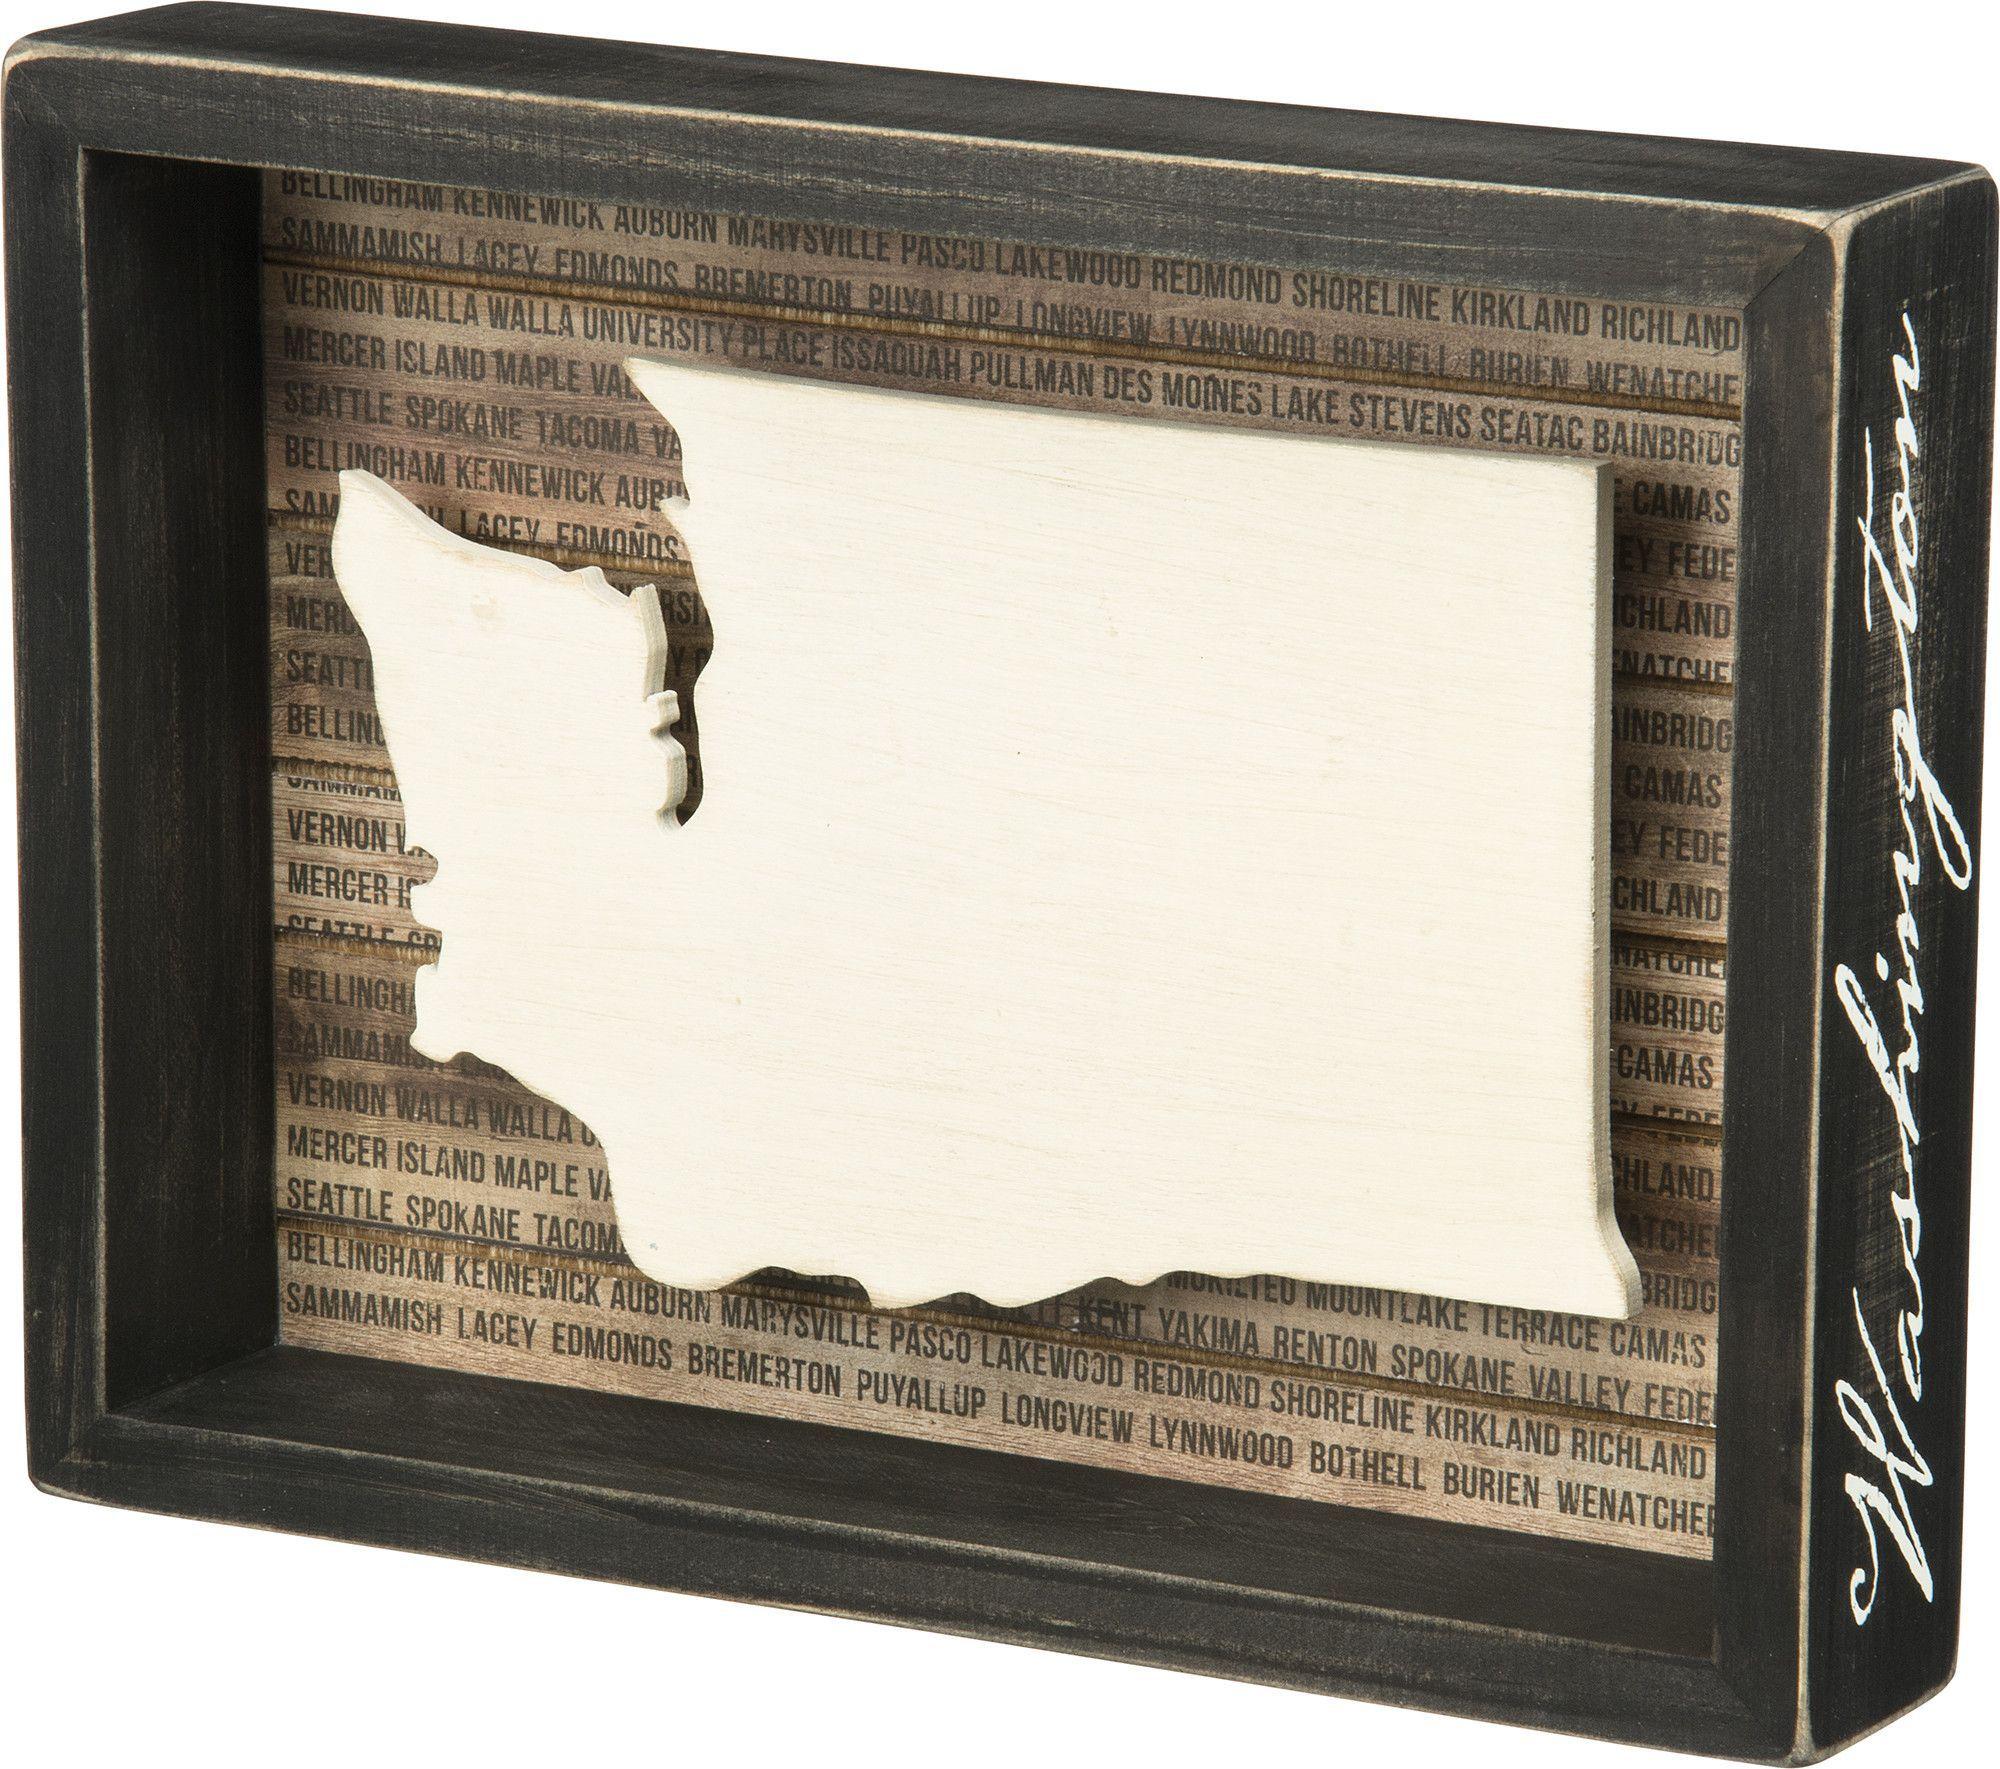 Fein Kirkland Rahmen Gläser Fotos - Benutzerdefinierte Bilderrahmen ...